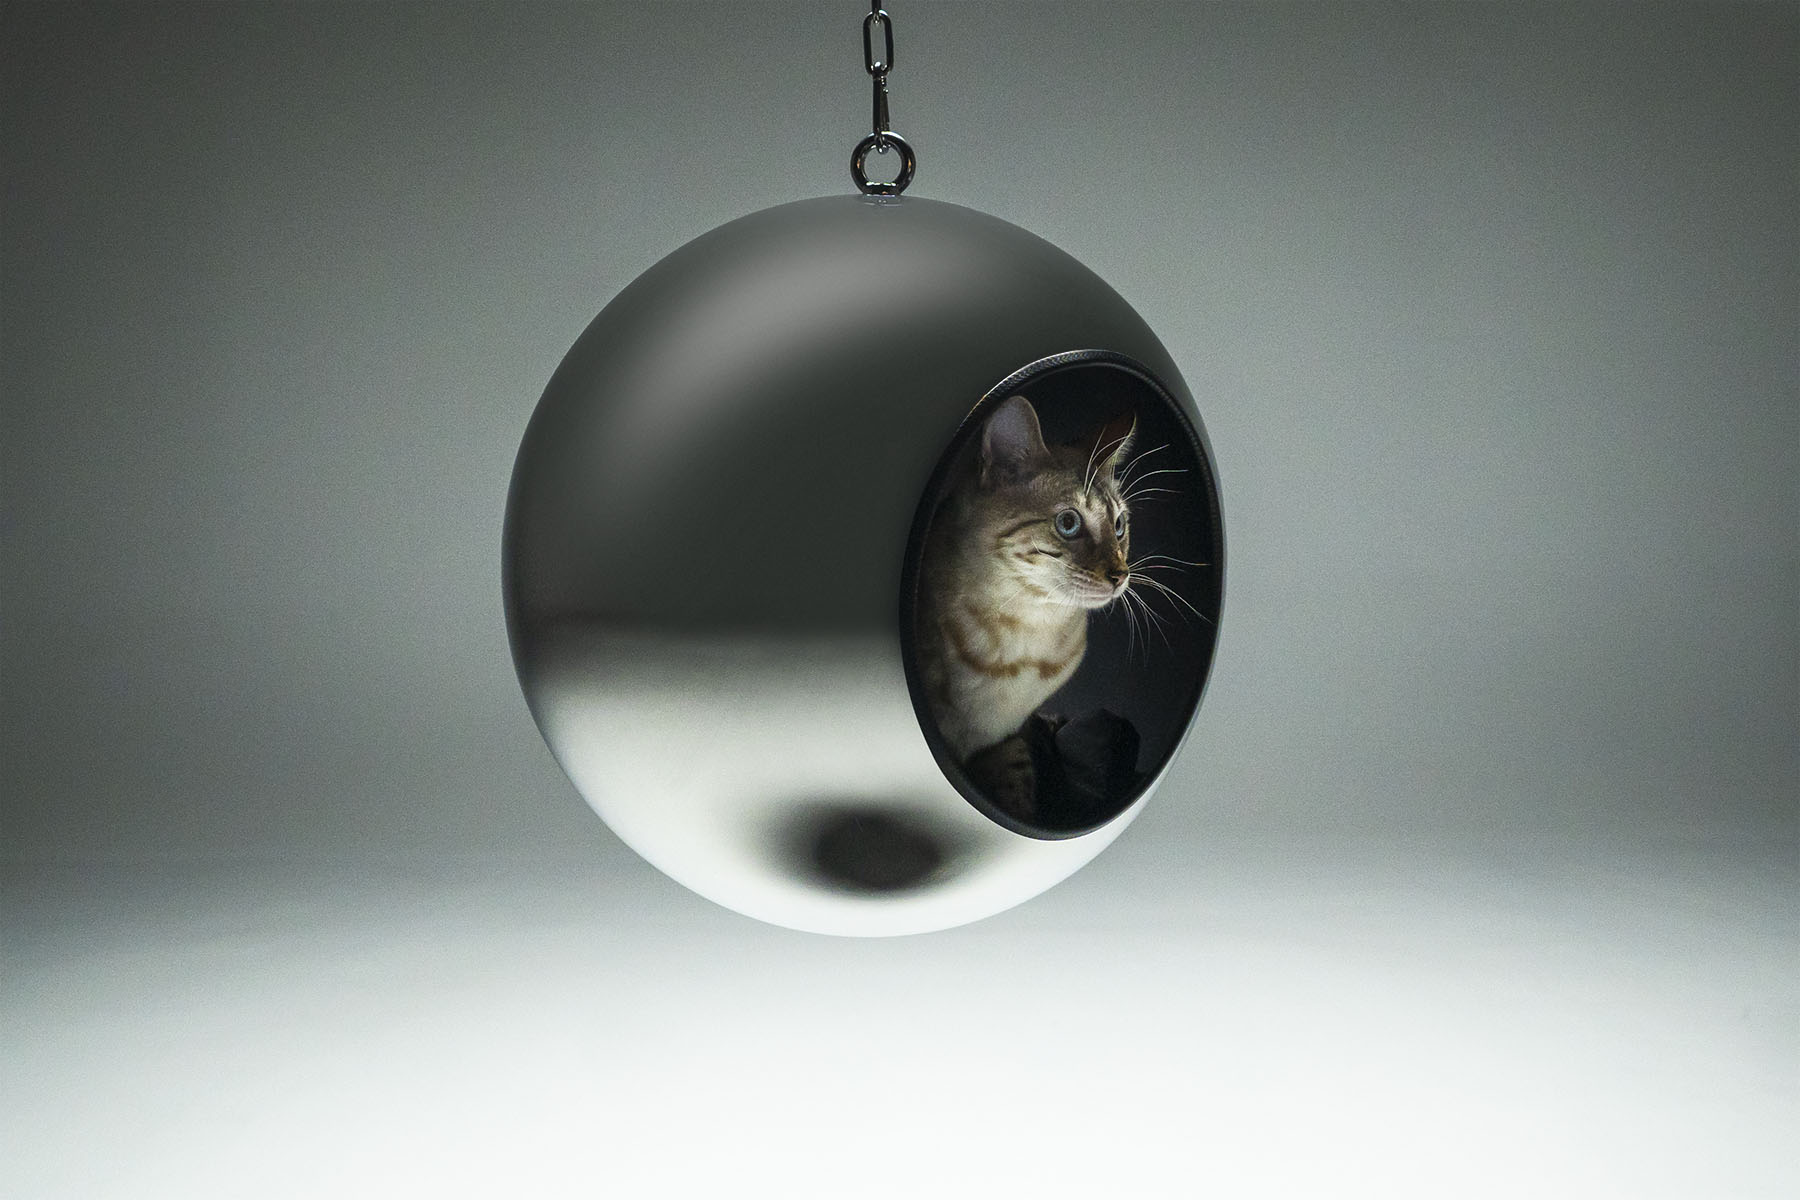 Piranjas Pluto Cat Bed (Variant 16)